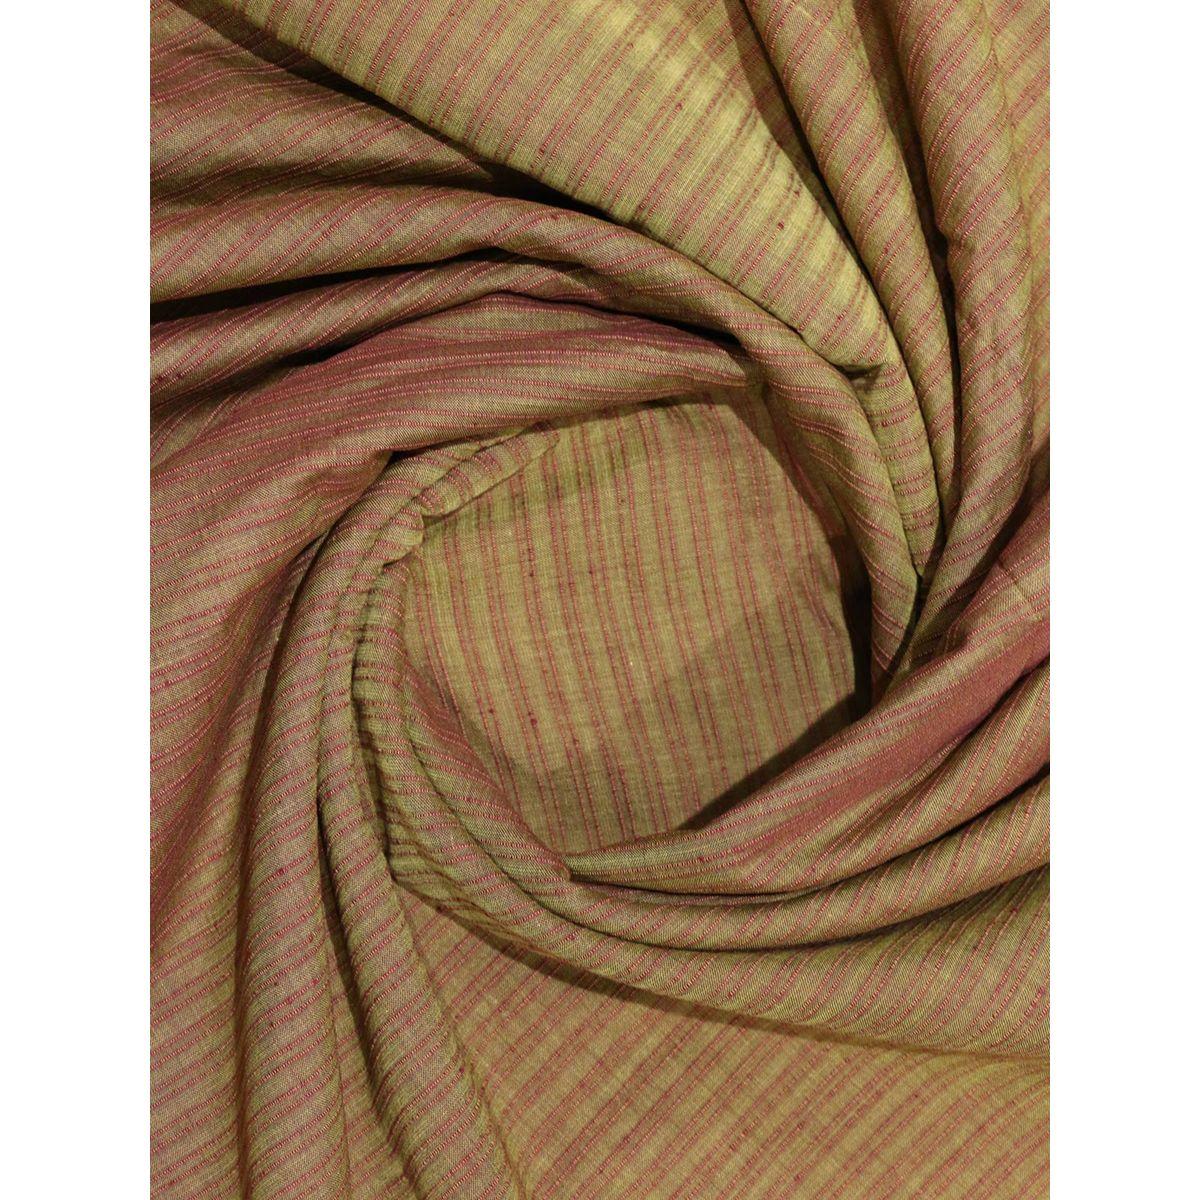 Buy Light Brown Color Mangalgiri Stripes Handloom Cotton